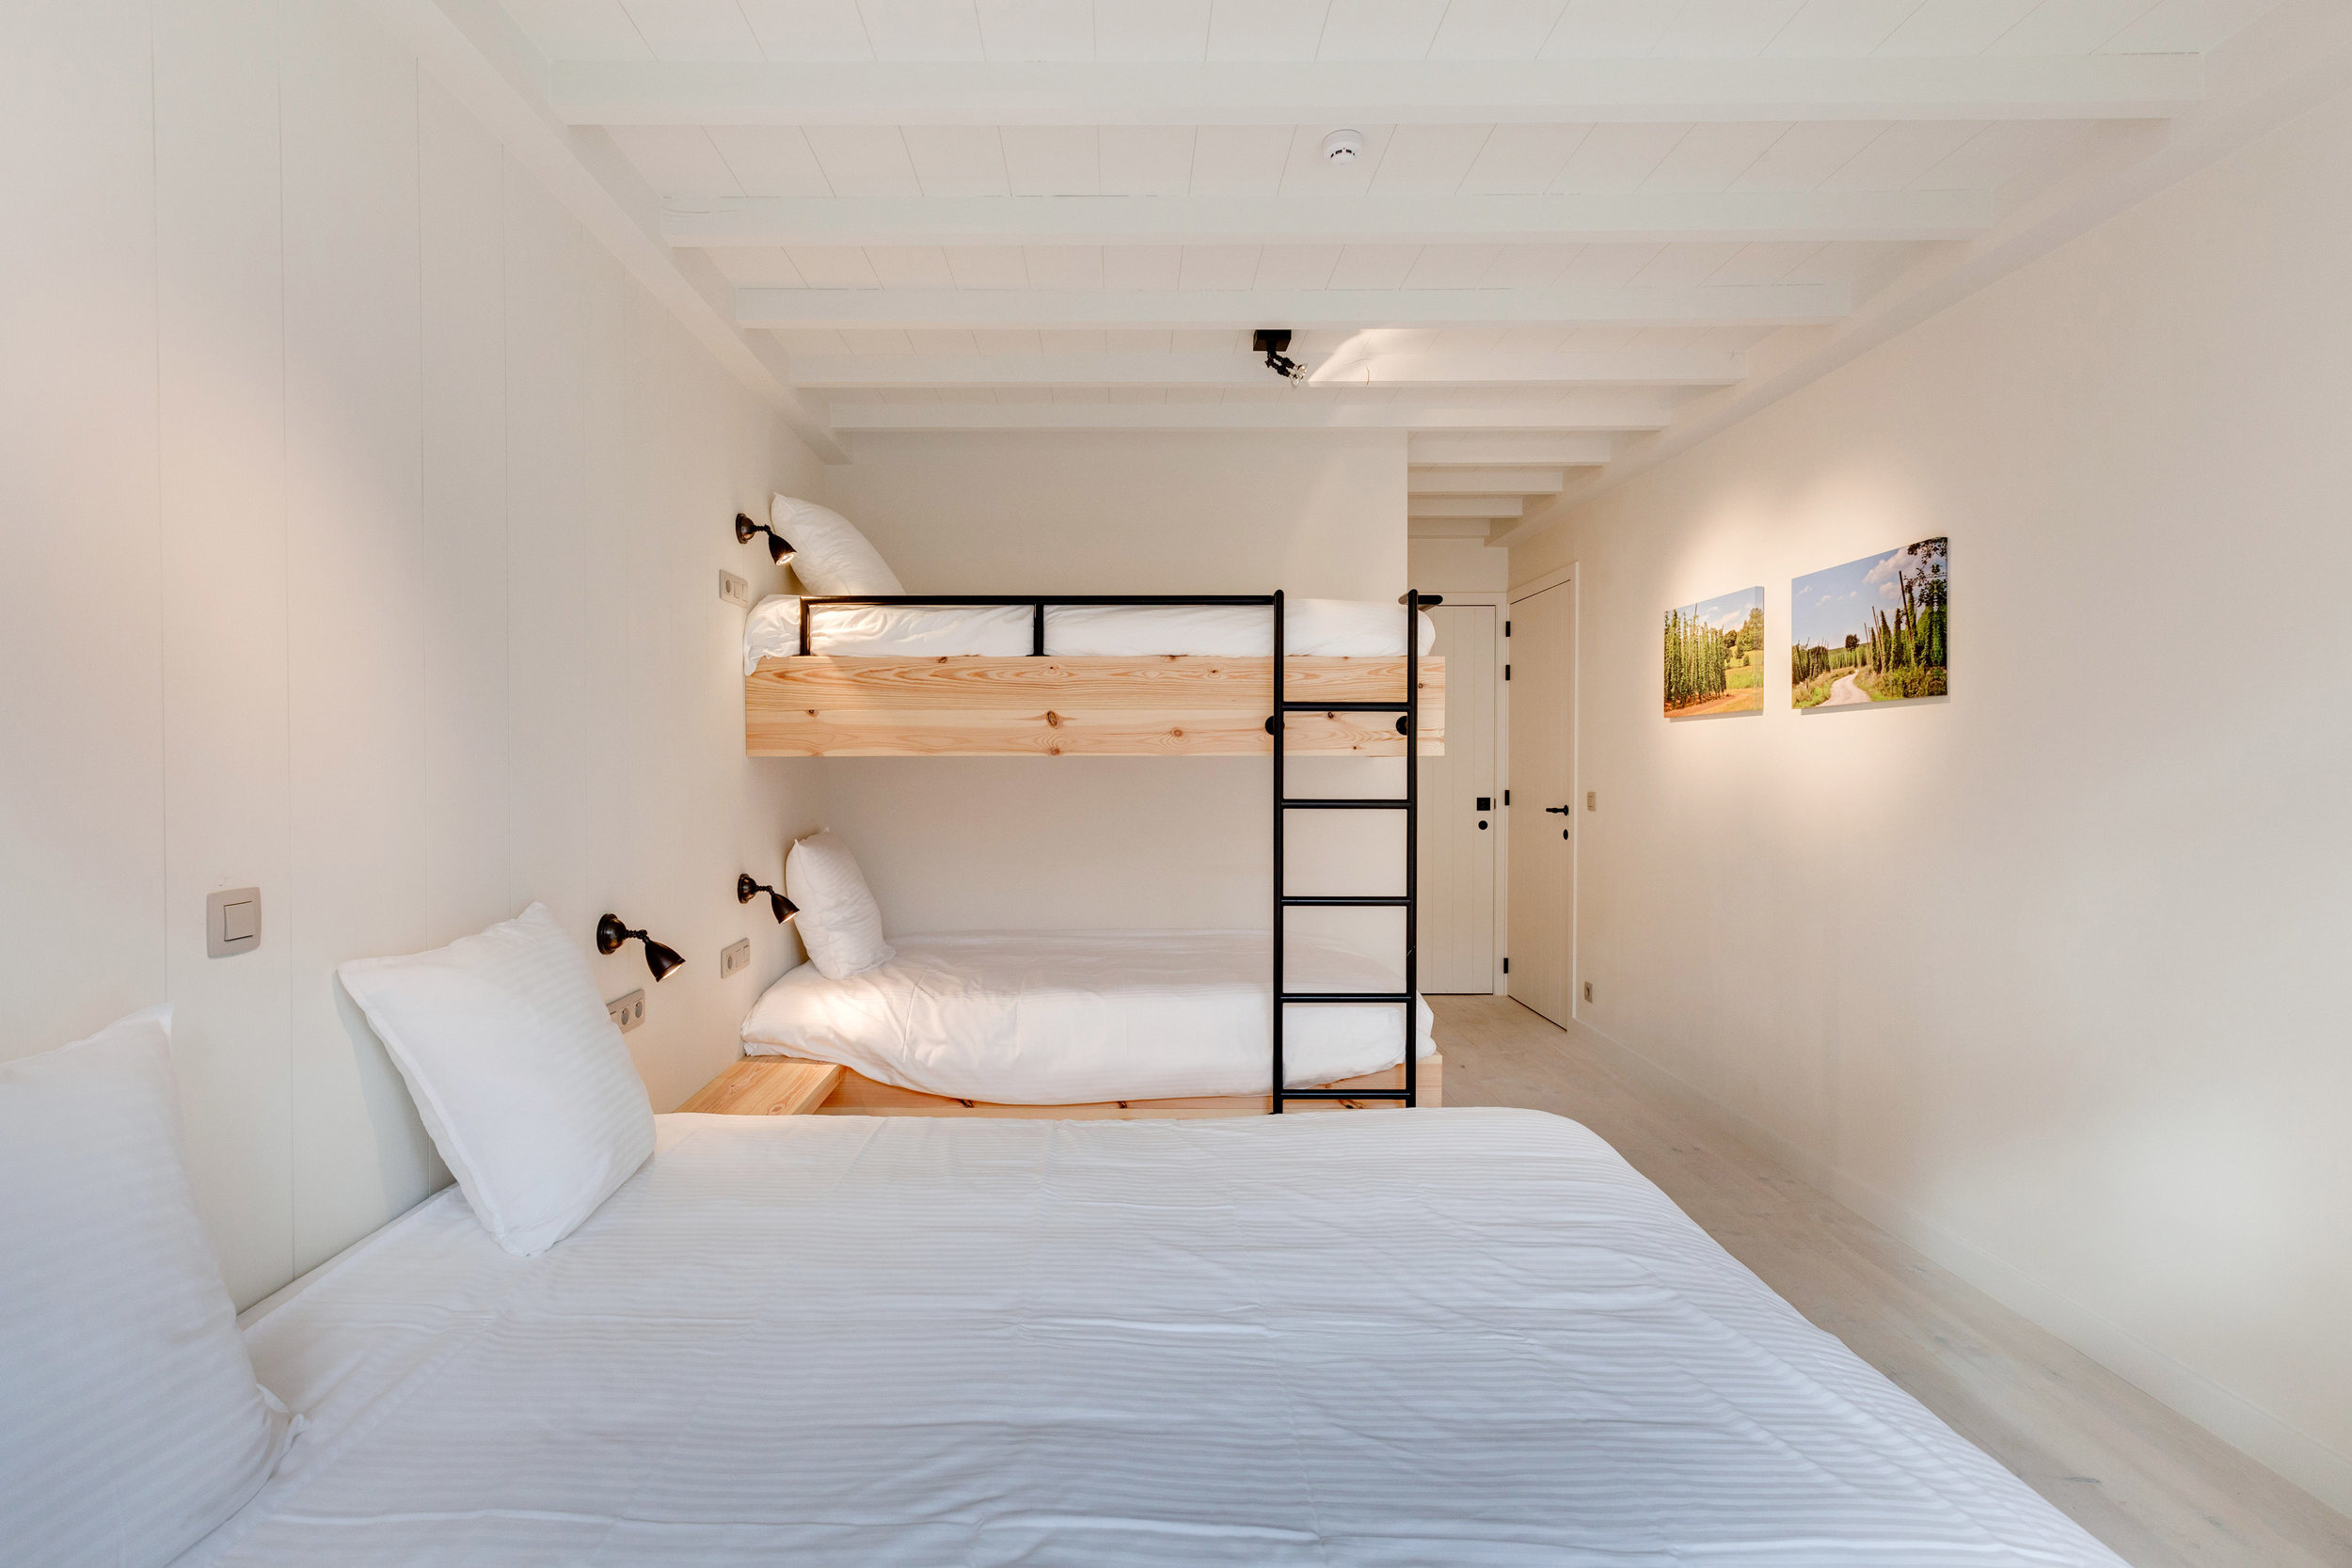 Vakantiehuis Watou-001.jpg